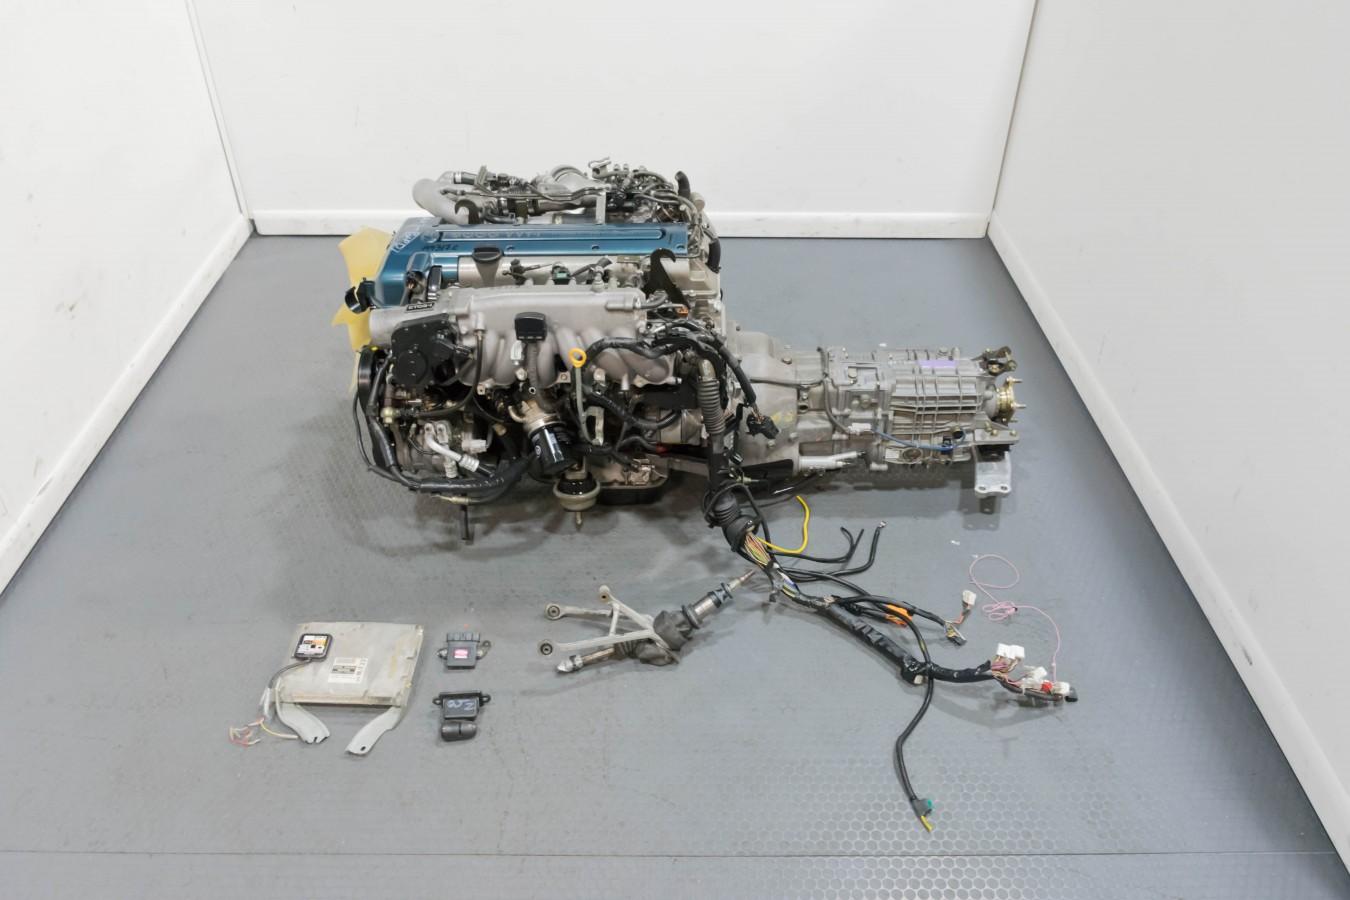 JDM Premium Quality Toyota Supra 2JZ-GTE Twin Turbo VVTi Engine with V161 6  Speed Getrag Transmission